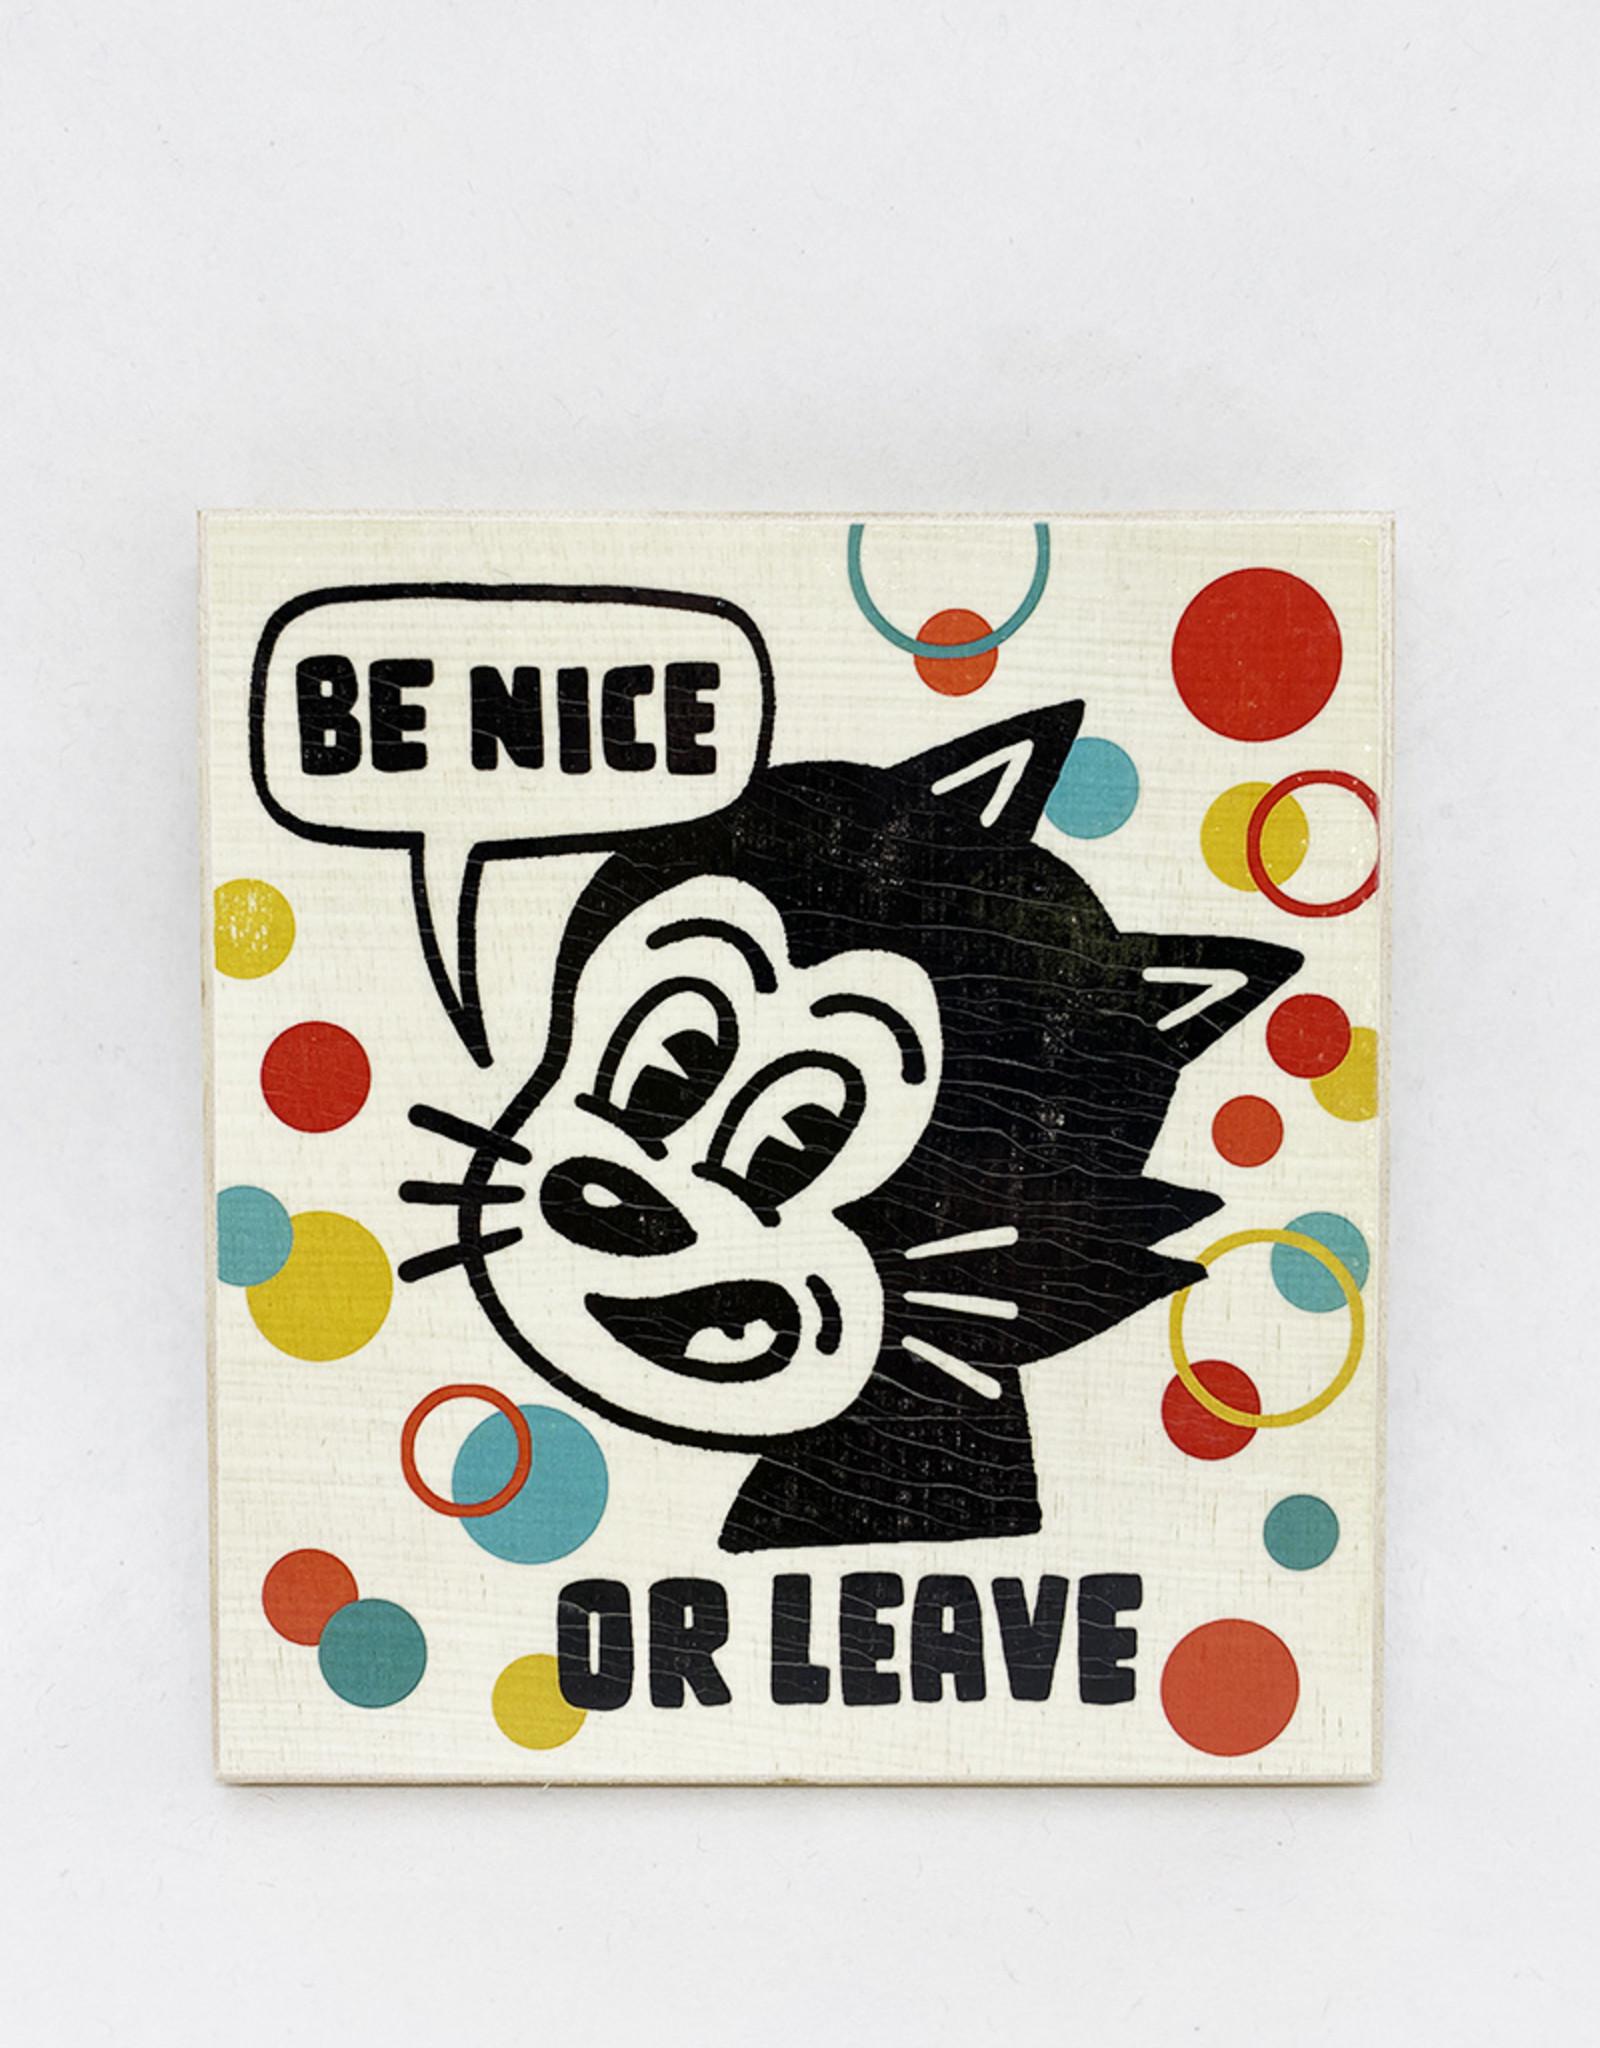 Dick Daniels Be Nice or Leave Image Transfer on Wood Block